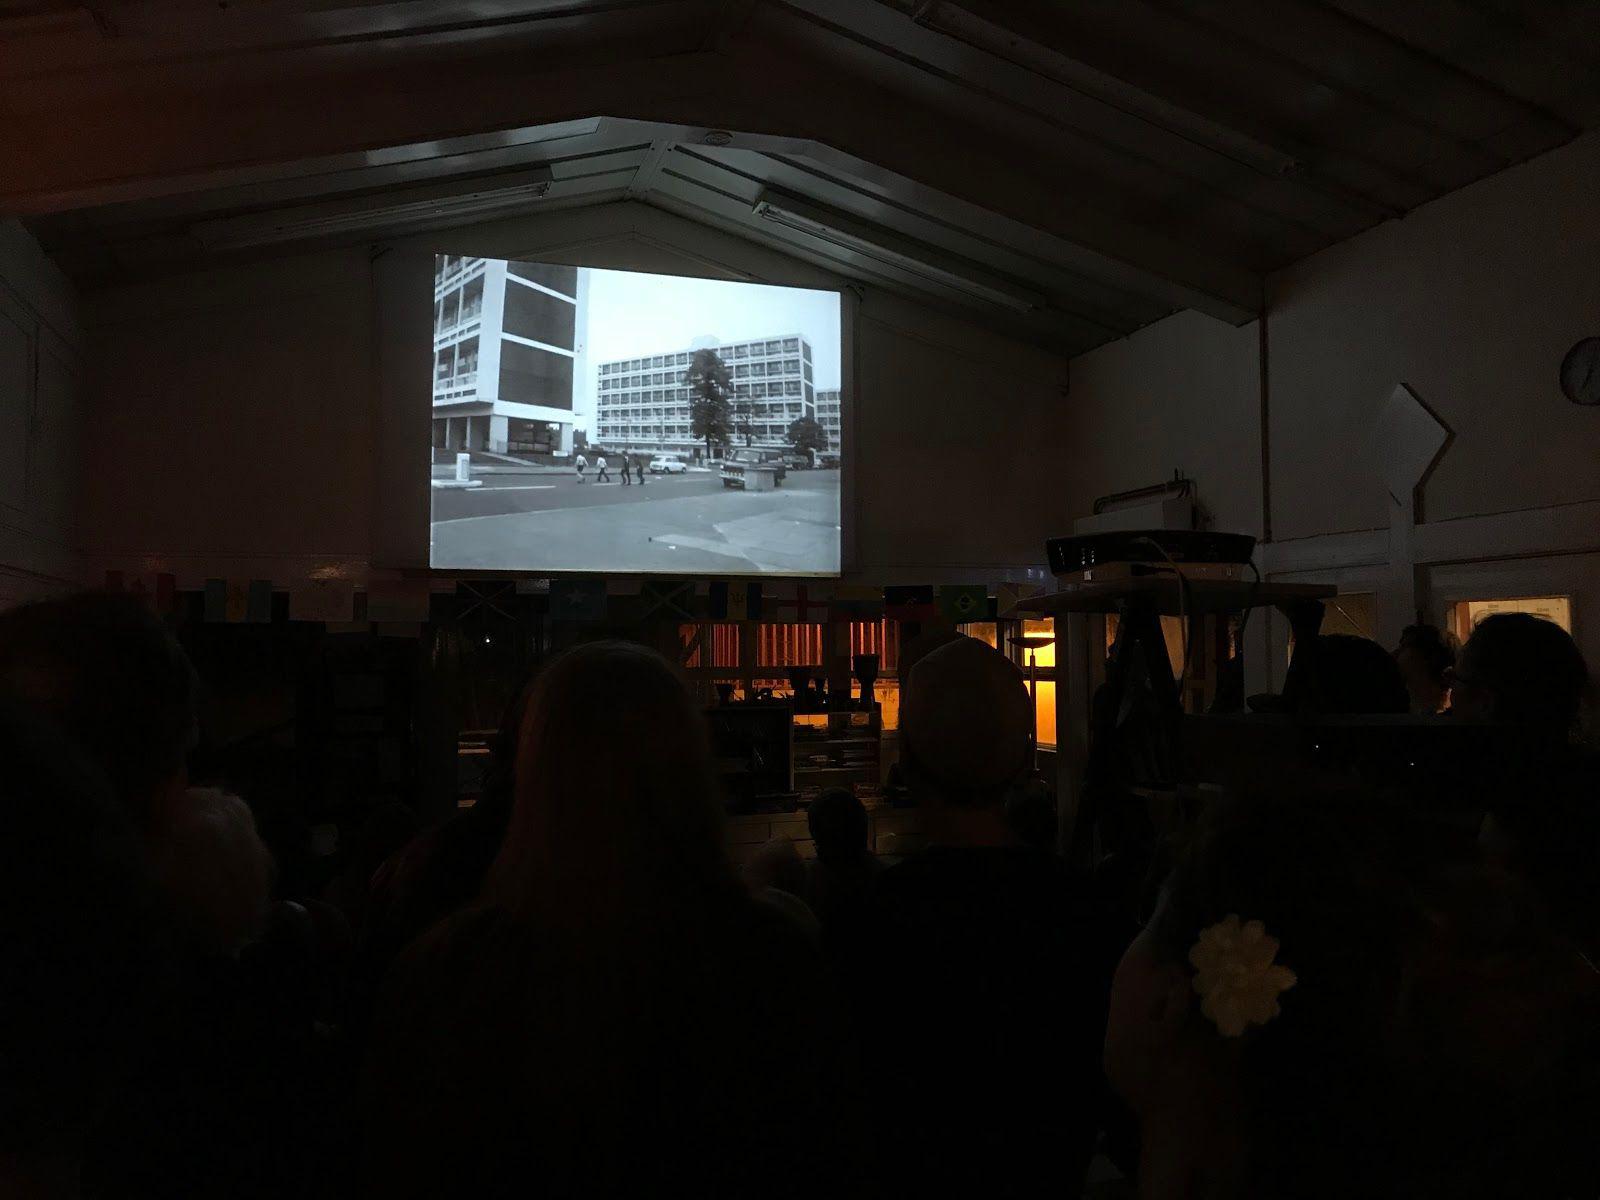 Film Screening at the Loughborough gala